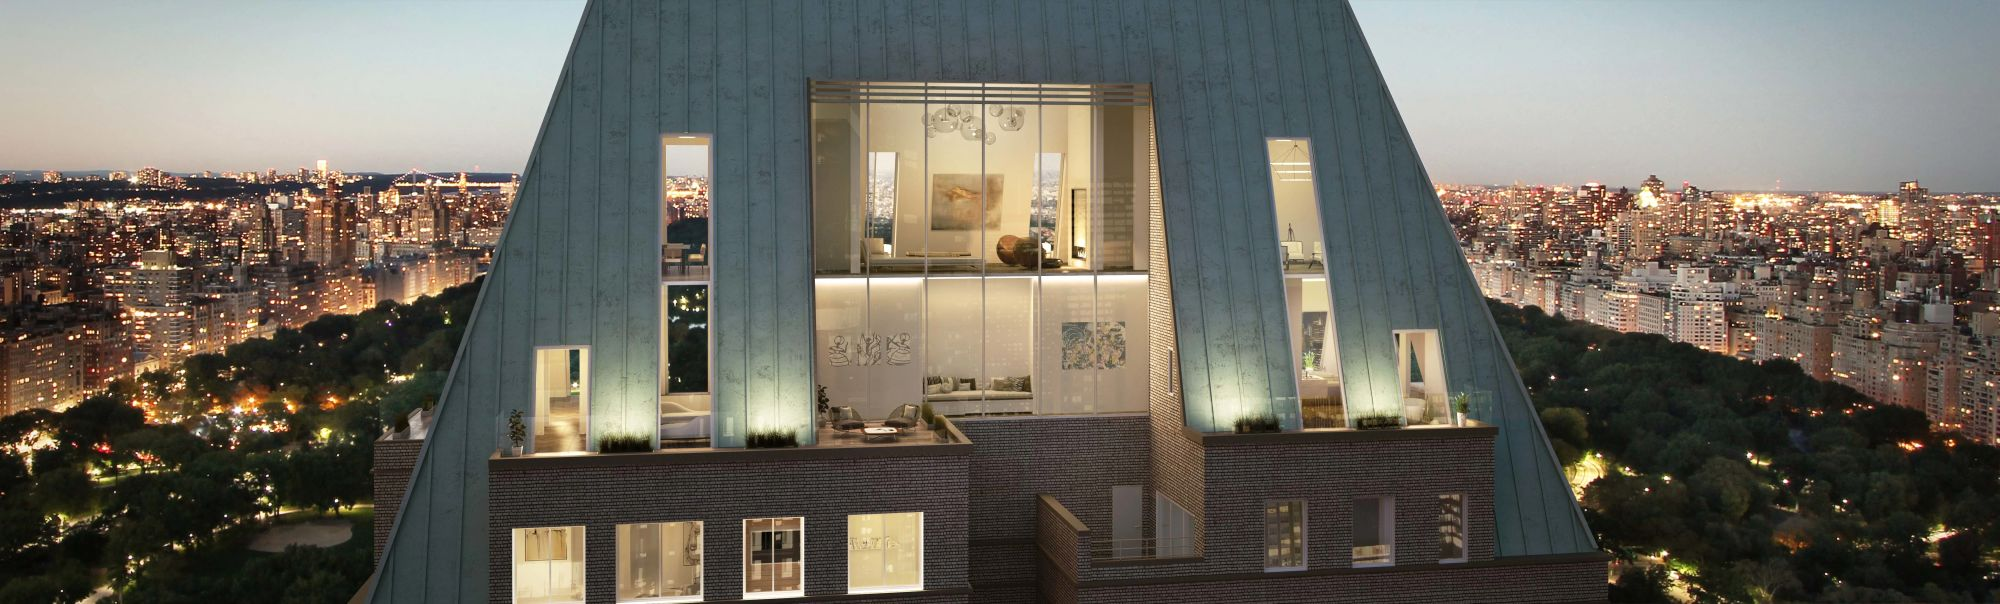 Concierge Auctions/Nest Seekers International